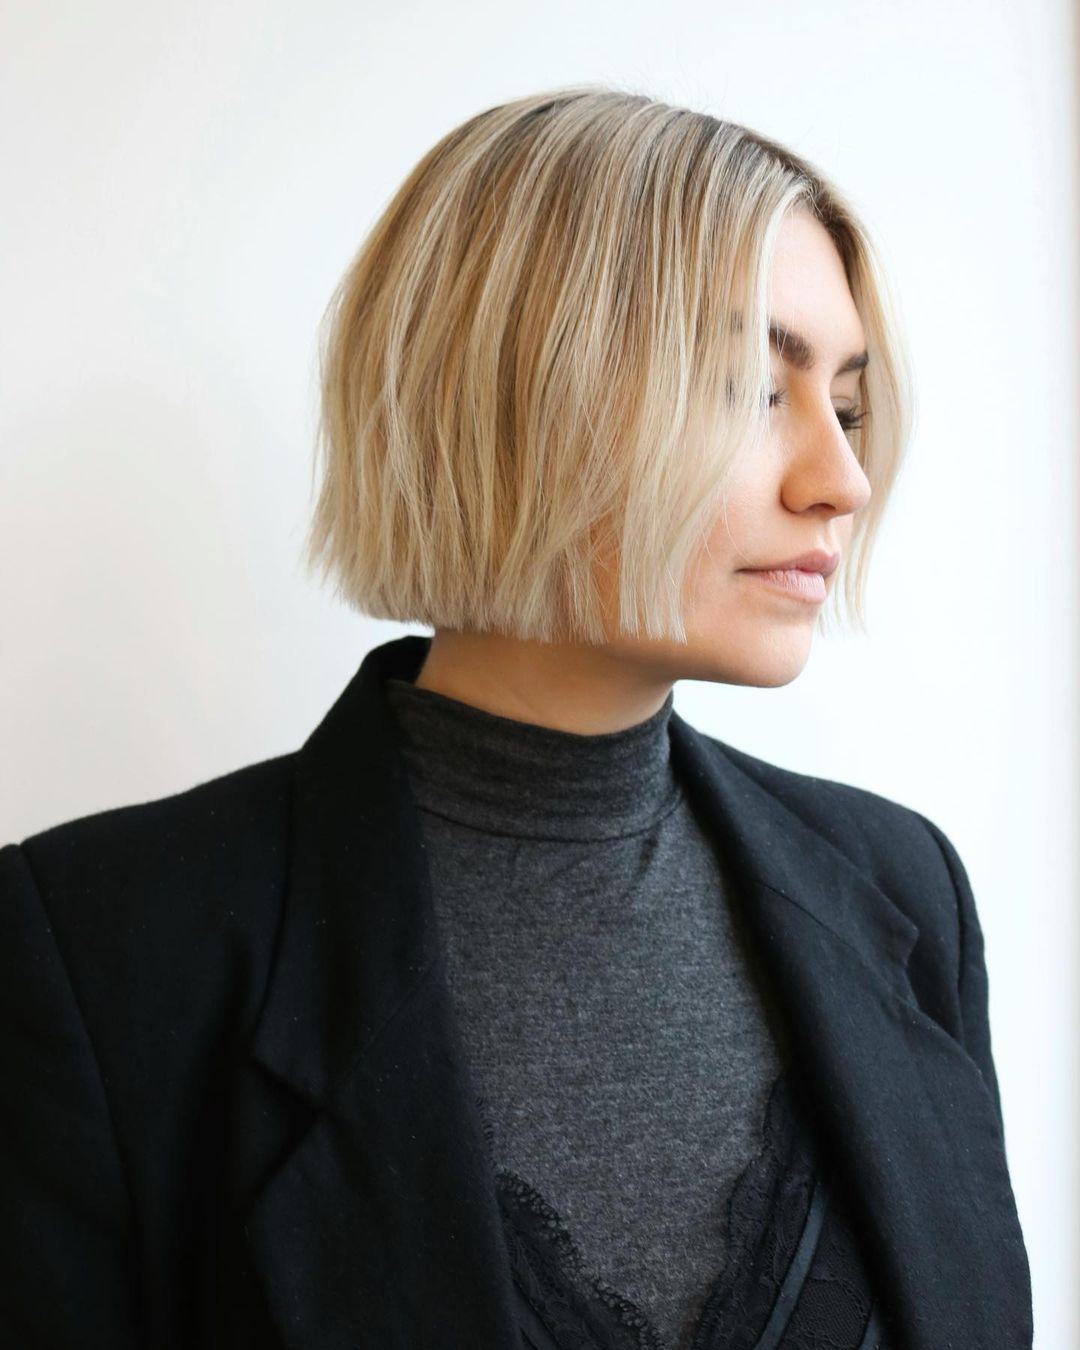 Short Blunt Blond Haircut